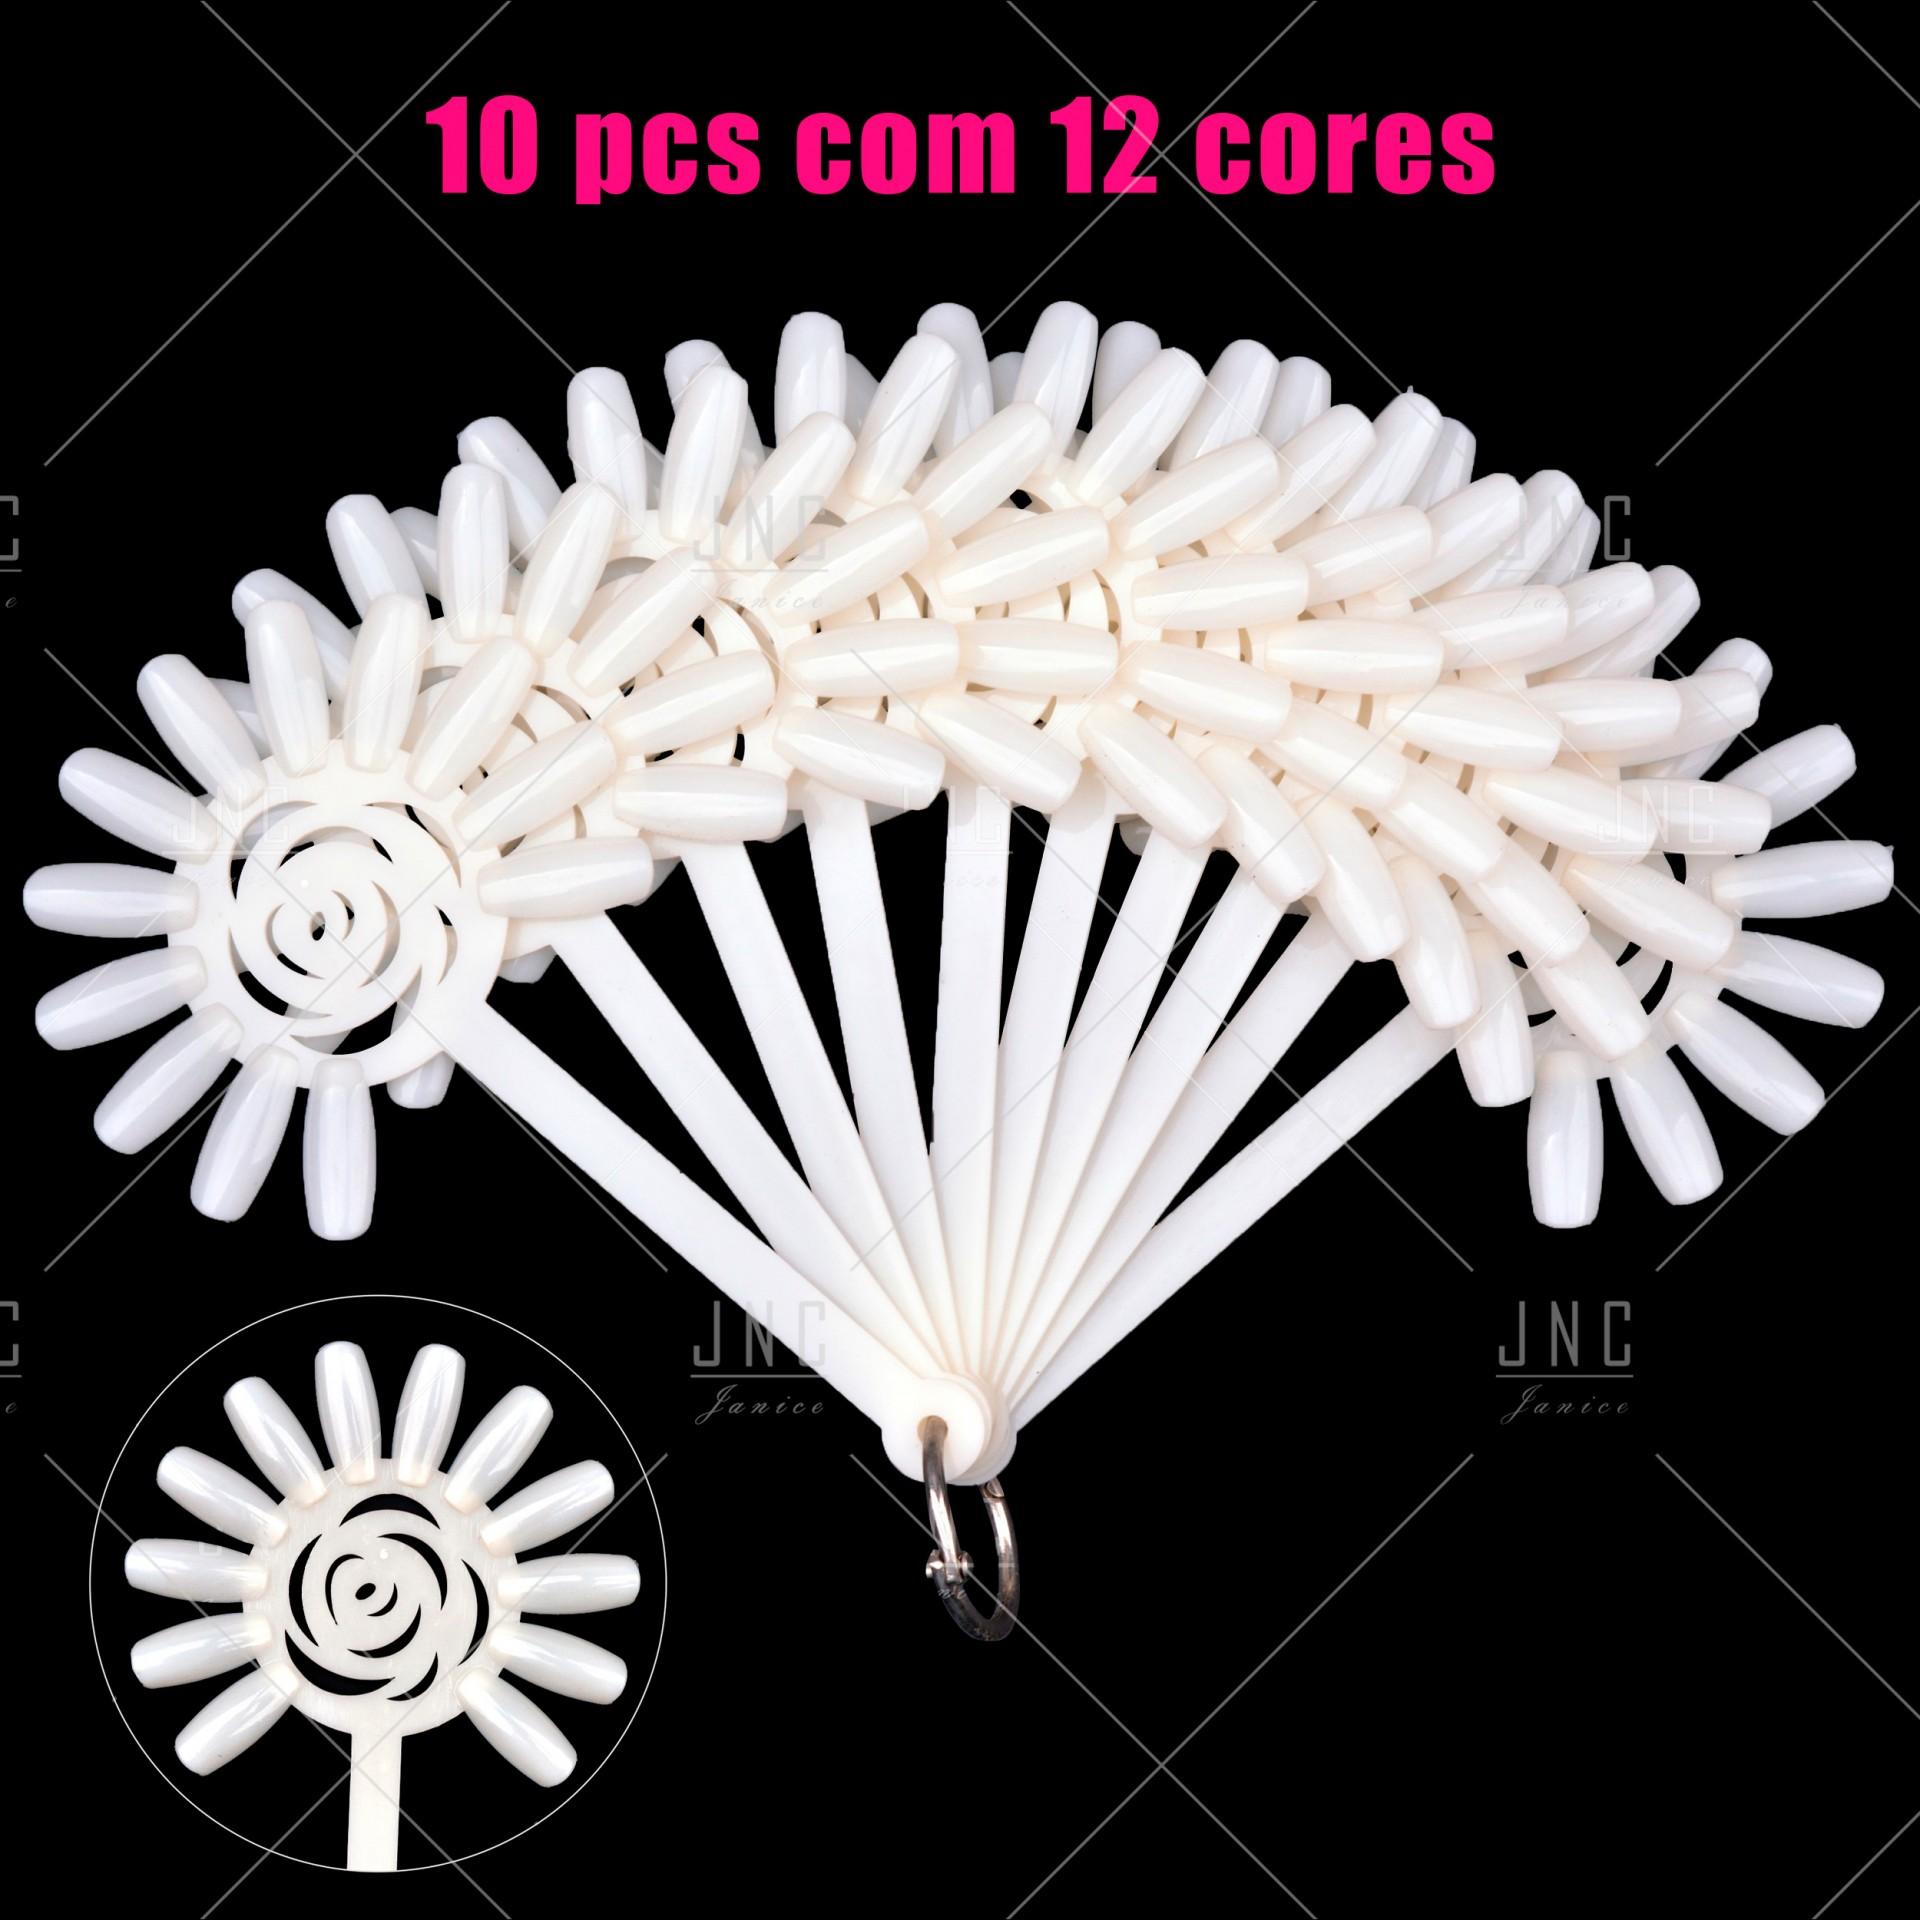 Expositor 10 PCS de 12 Cores | Ref.8861170